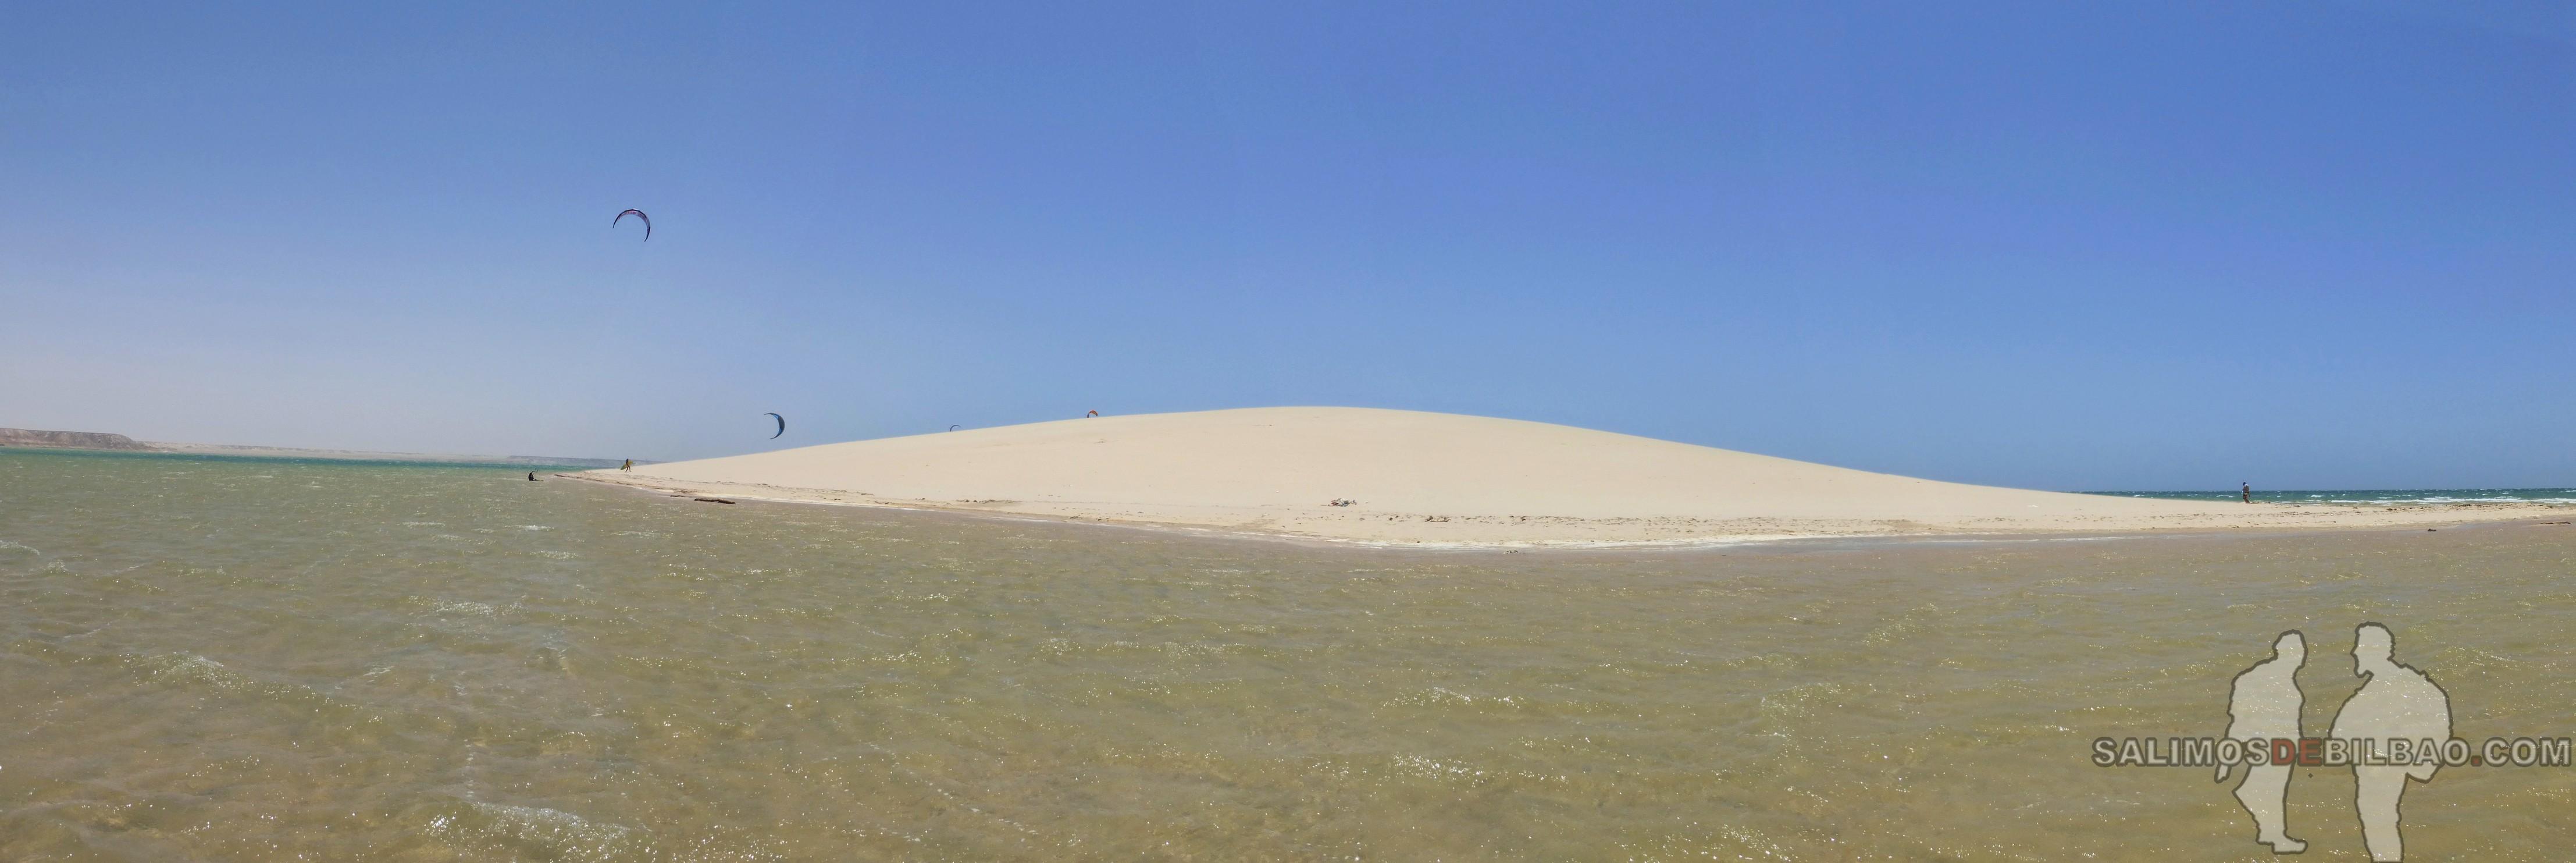 0096. Pano, Duna Blanca